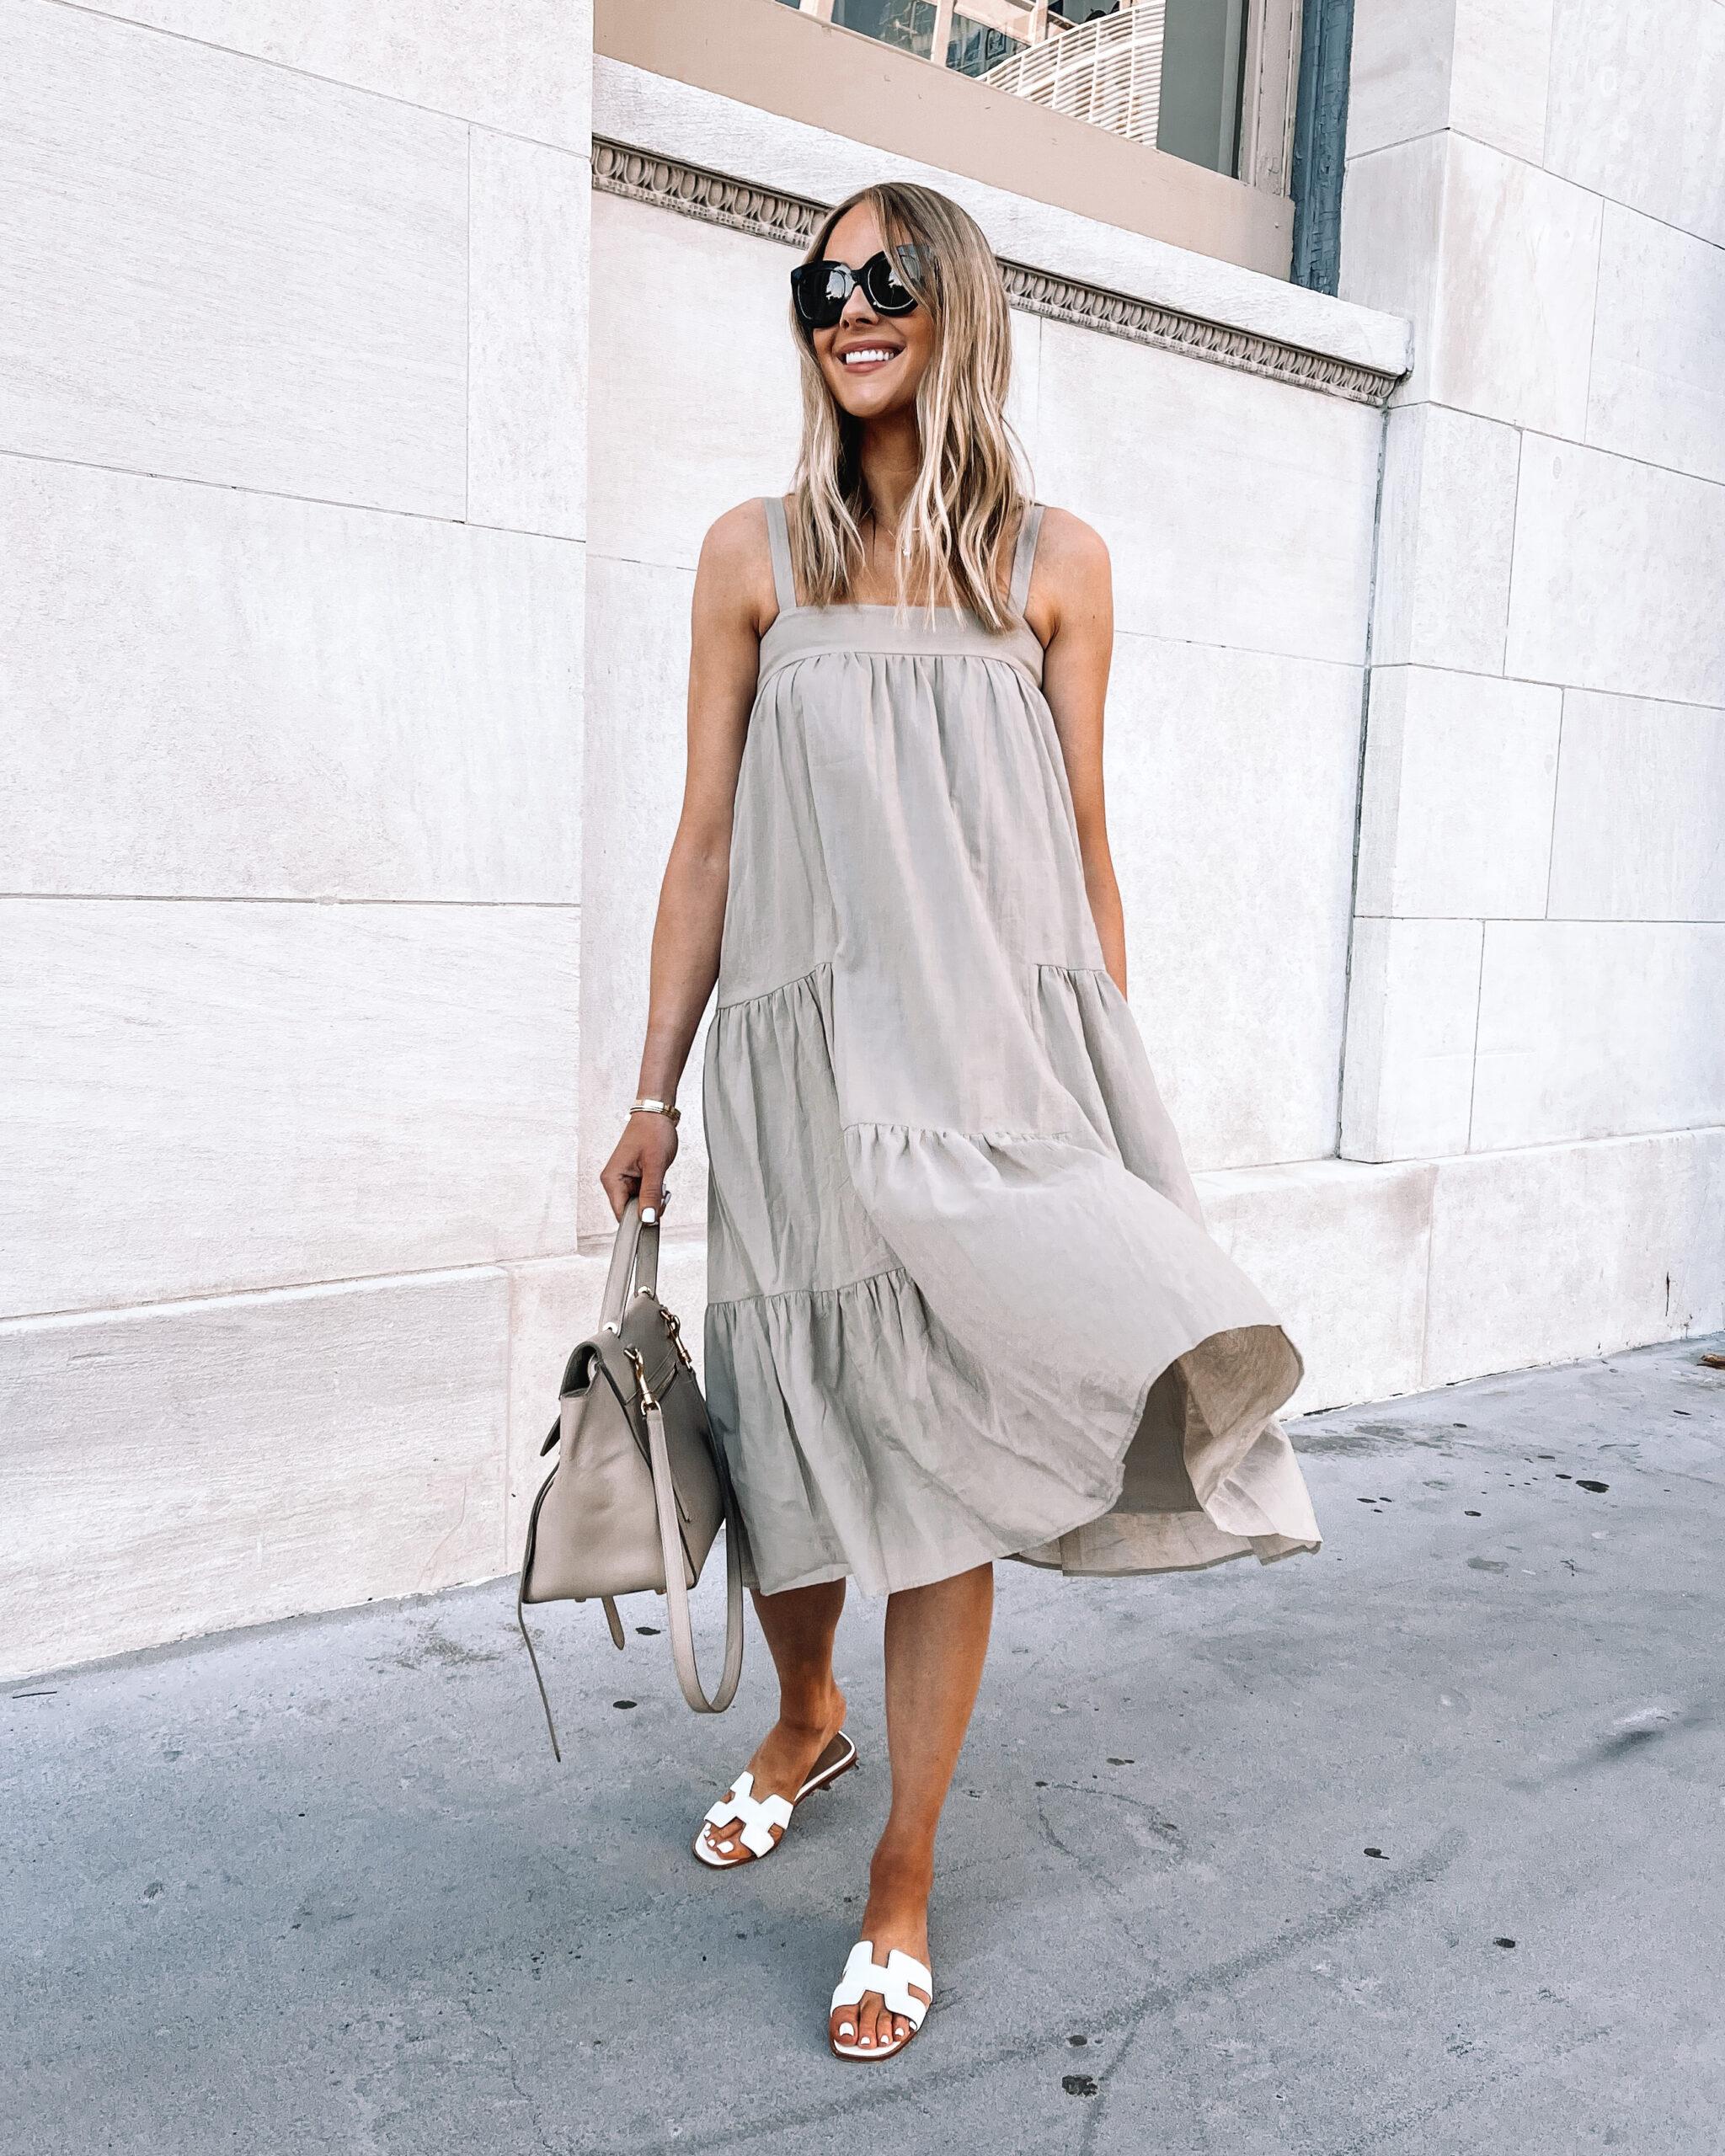 Fashion Jackson Wearing Jenni Kayne Tan Summer Dress White Hermes Oran Sandals Summer Dress Outfit